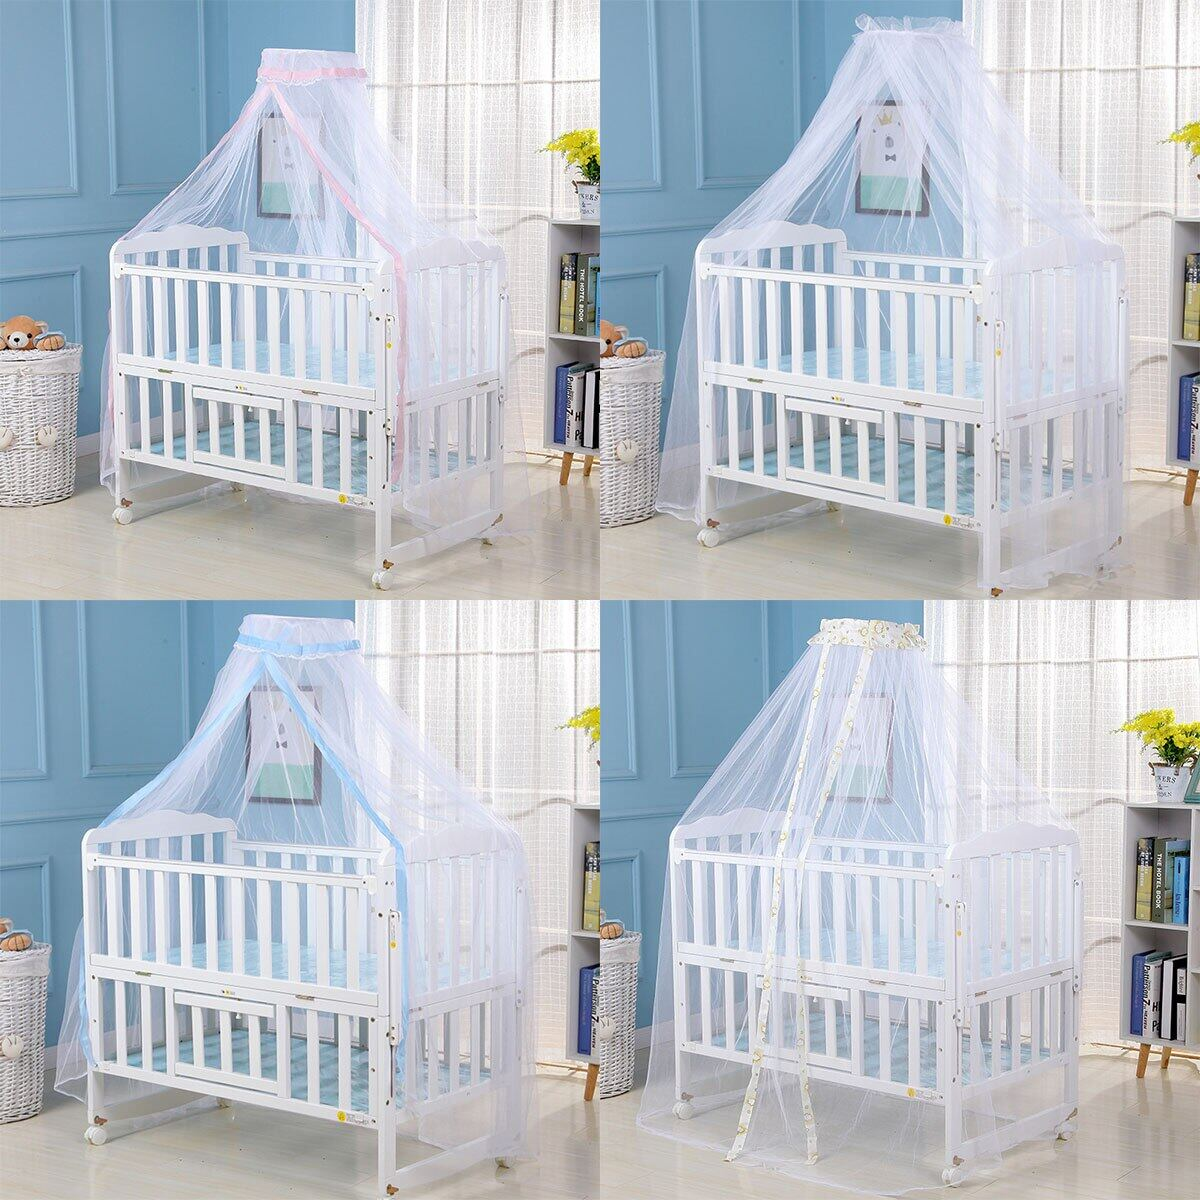 Newborn Summer Crib Mesh Mosquito Net Baby Bed Accessories Protection Net Lazada Singapore